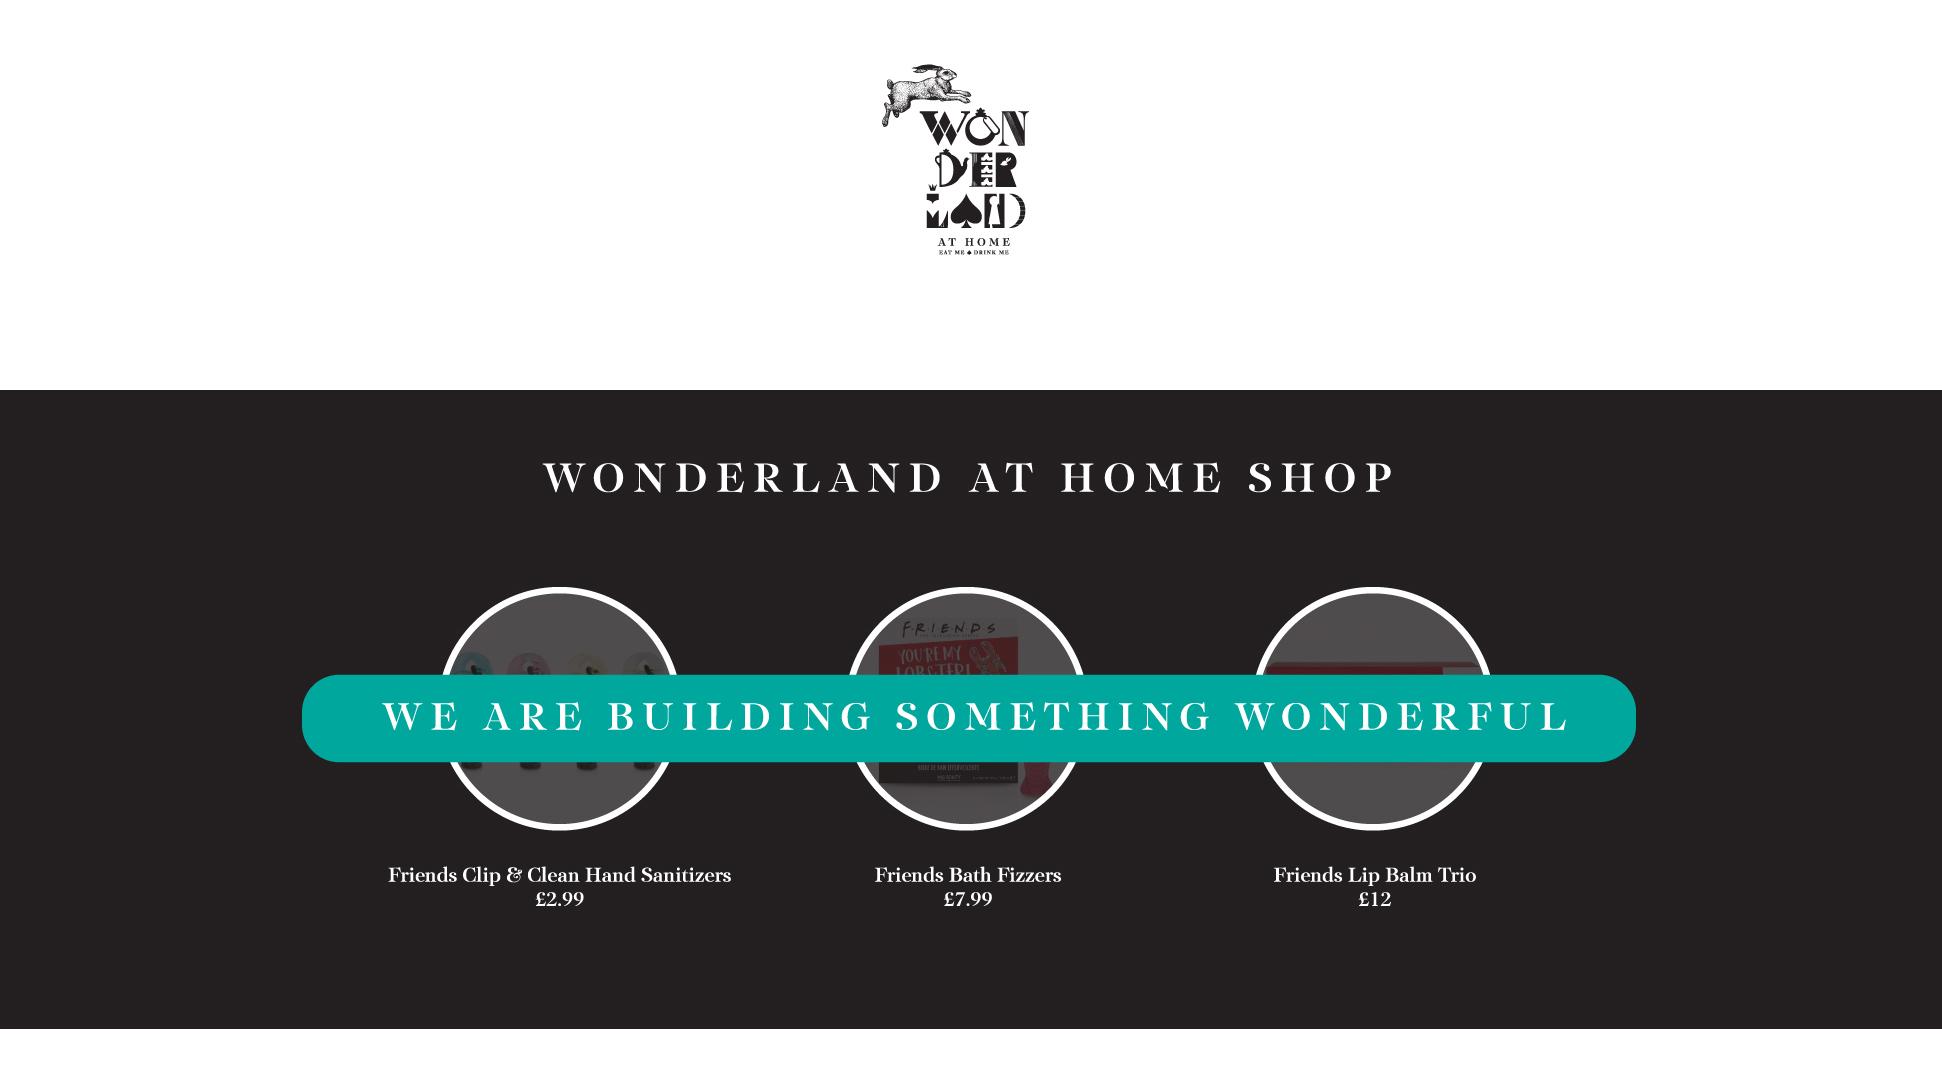 Wonderland At Home